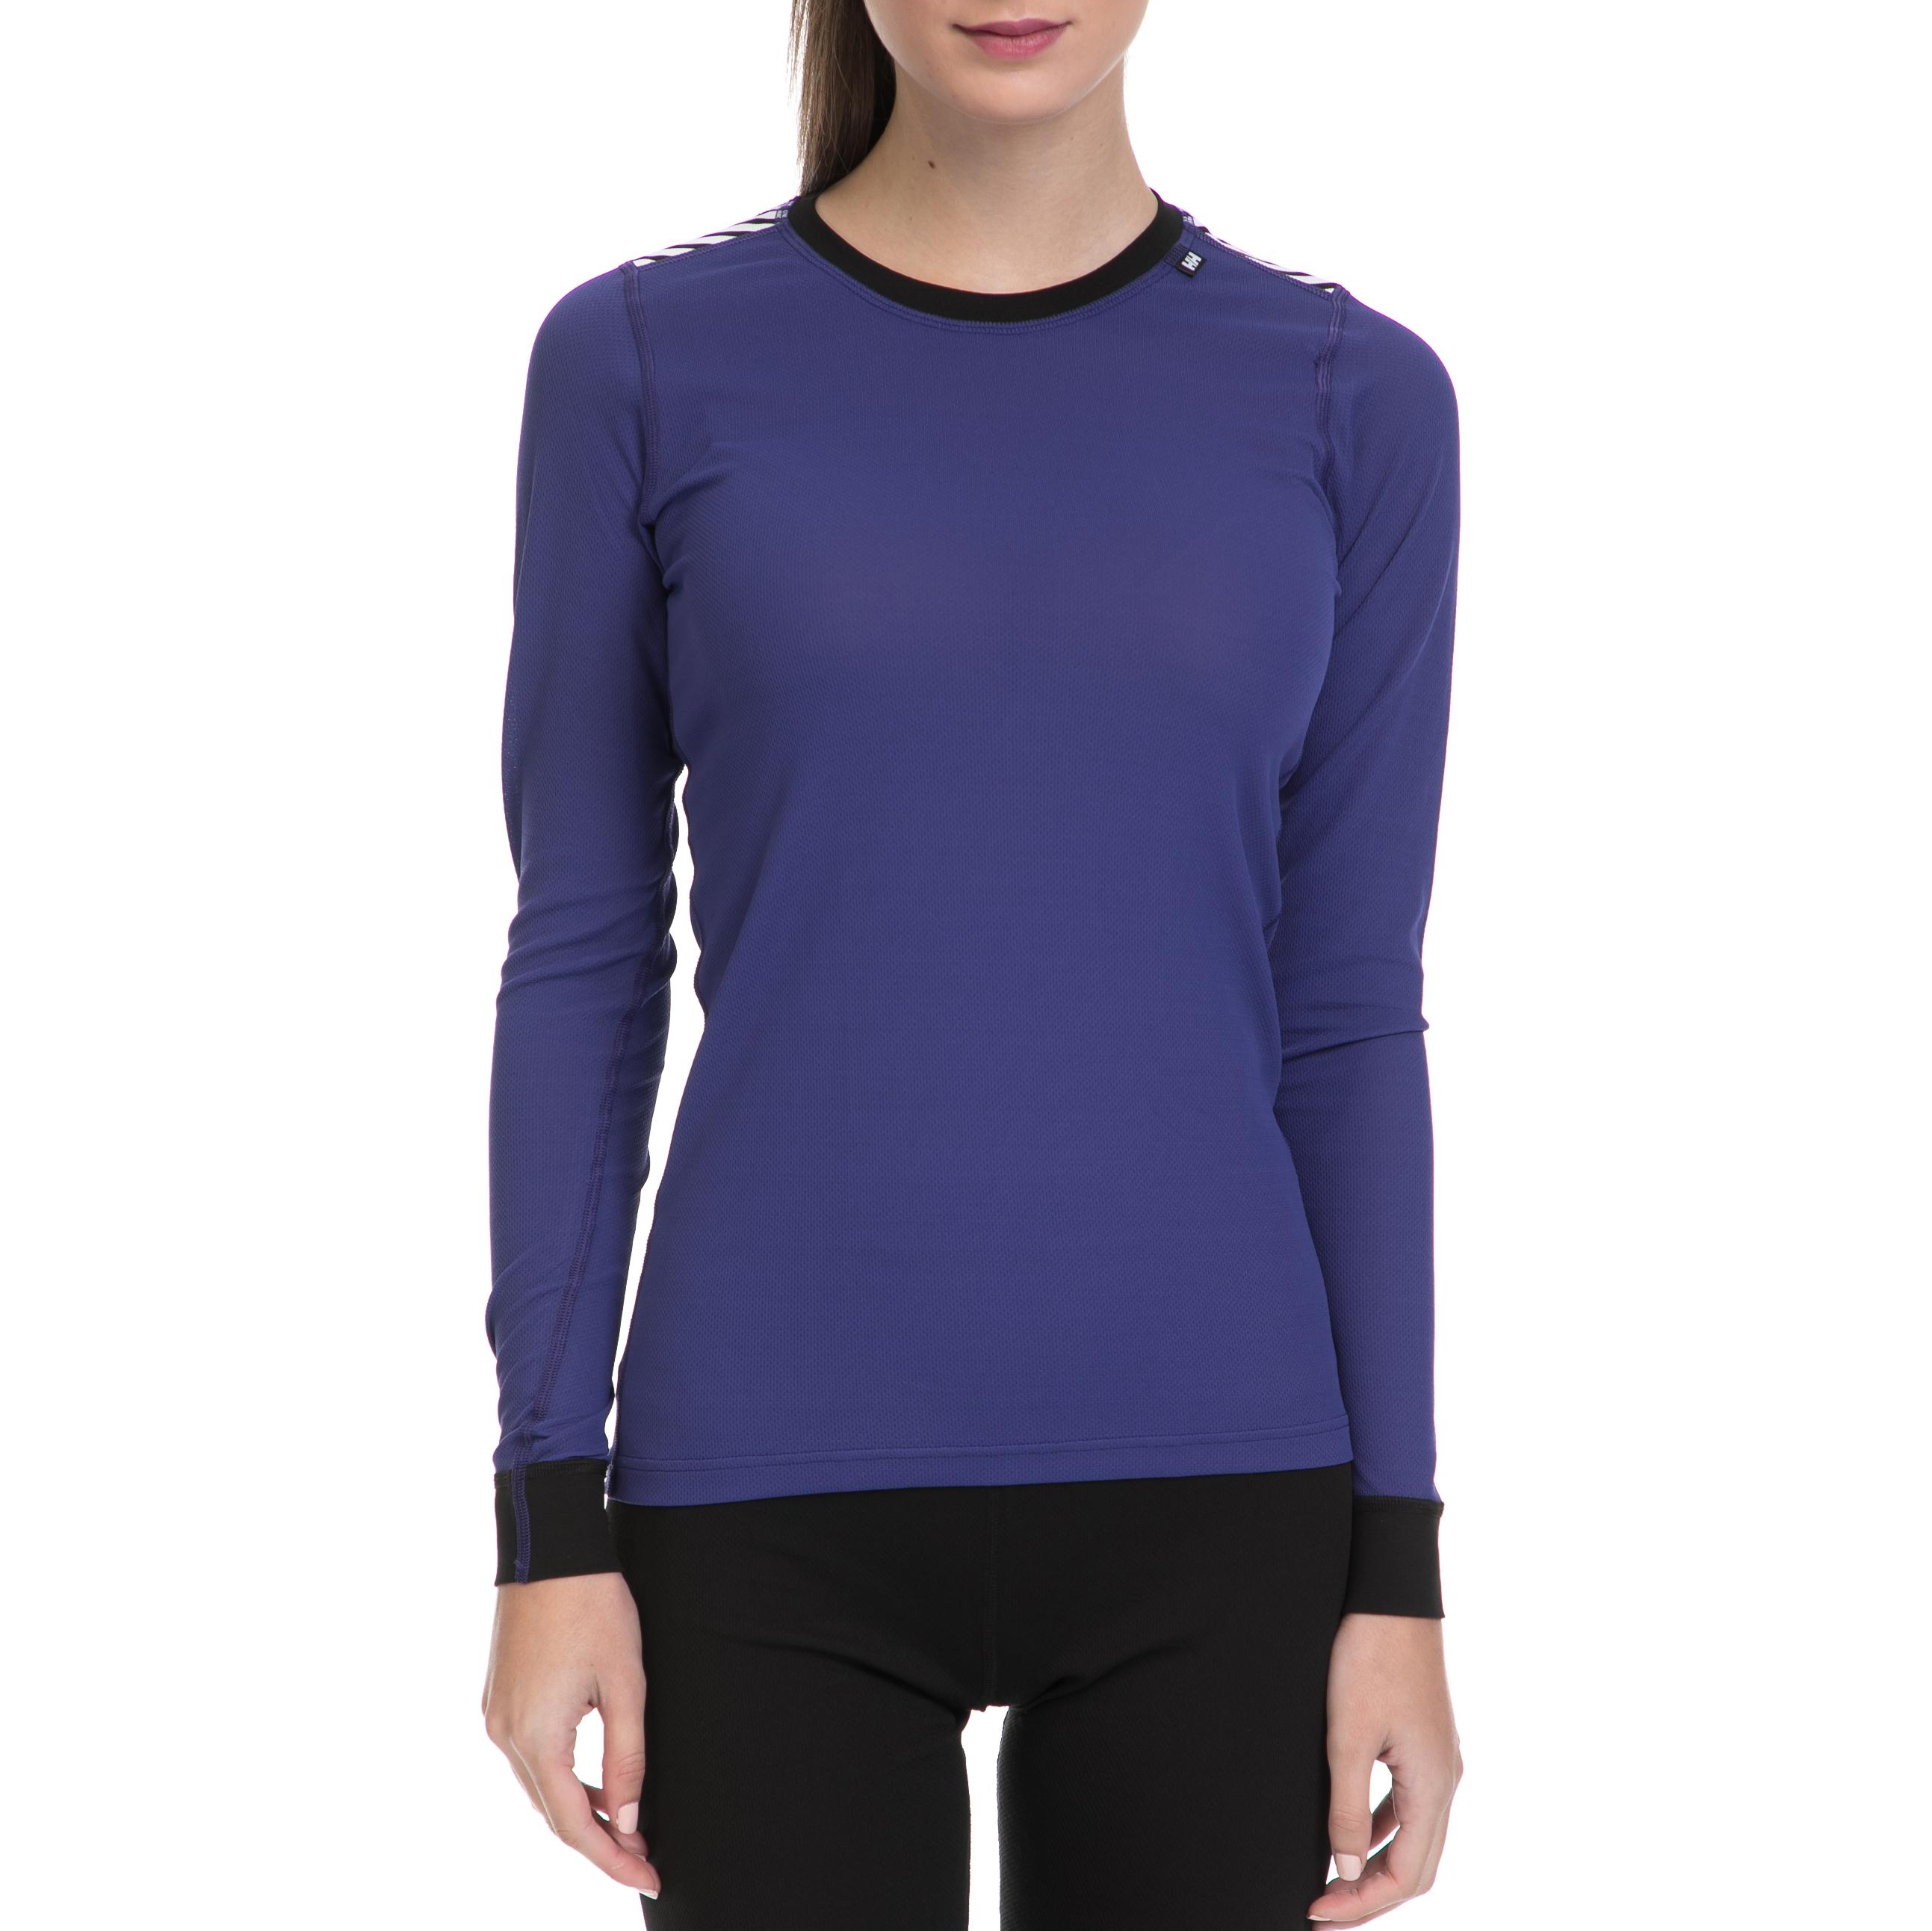 6221365c48fa HELLY HANSEN - Γυναικεία ισοθερμική μπλούζα HELLY HANSEN μοβ